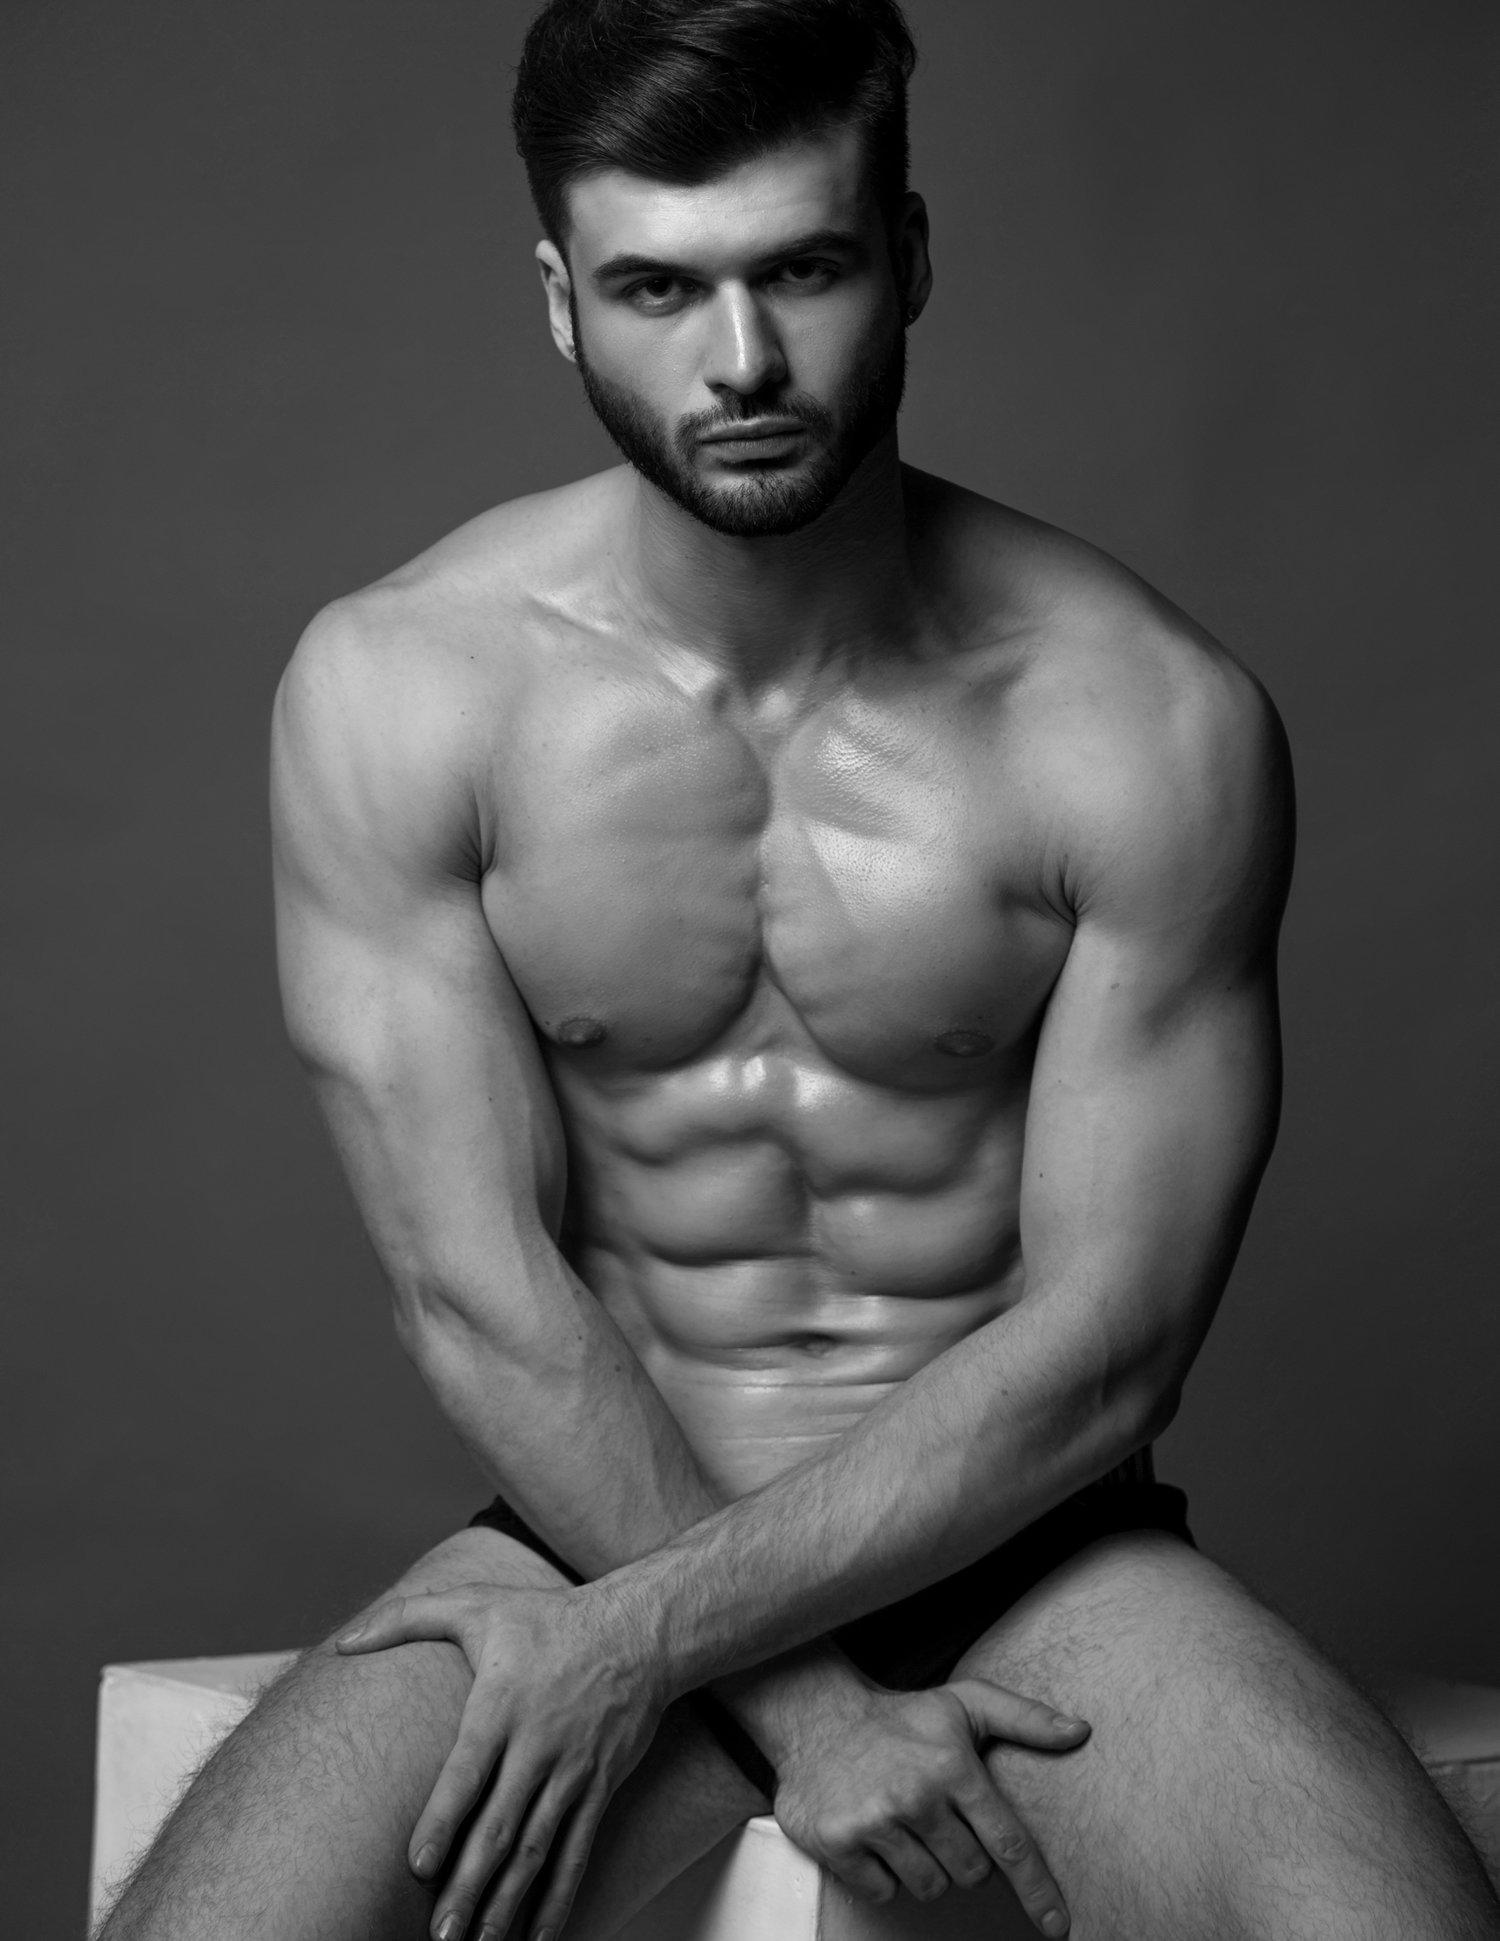 Adon Exclusive: Model Vlad Kartamishev By Savinov Alexey